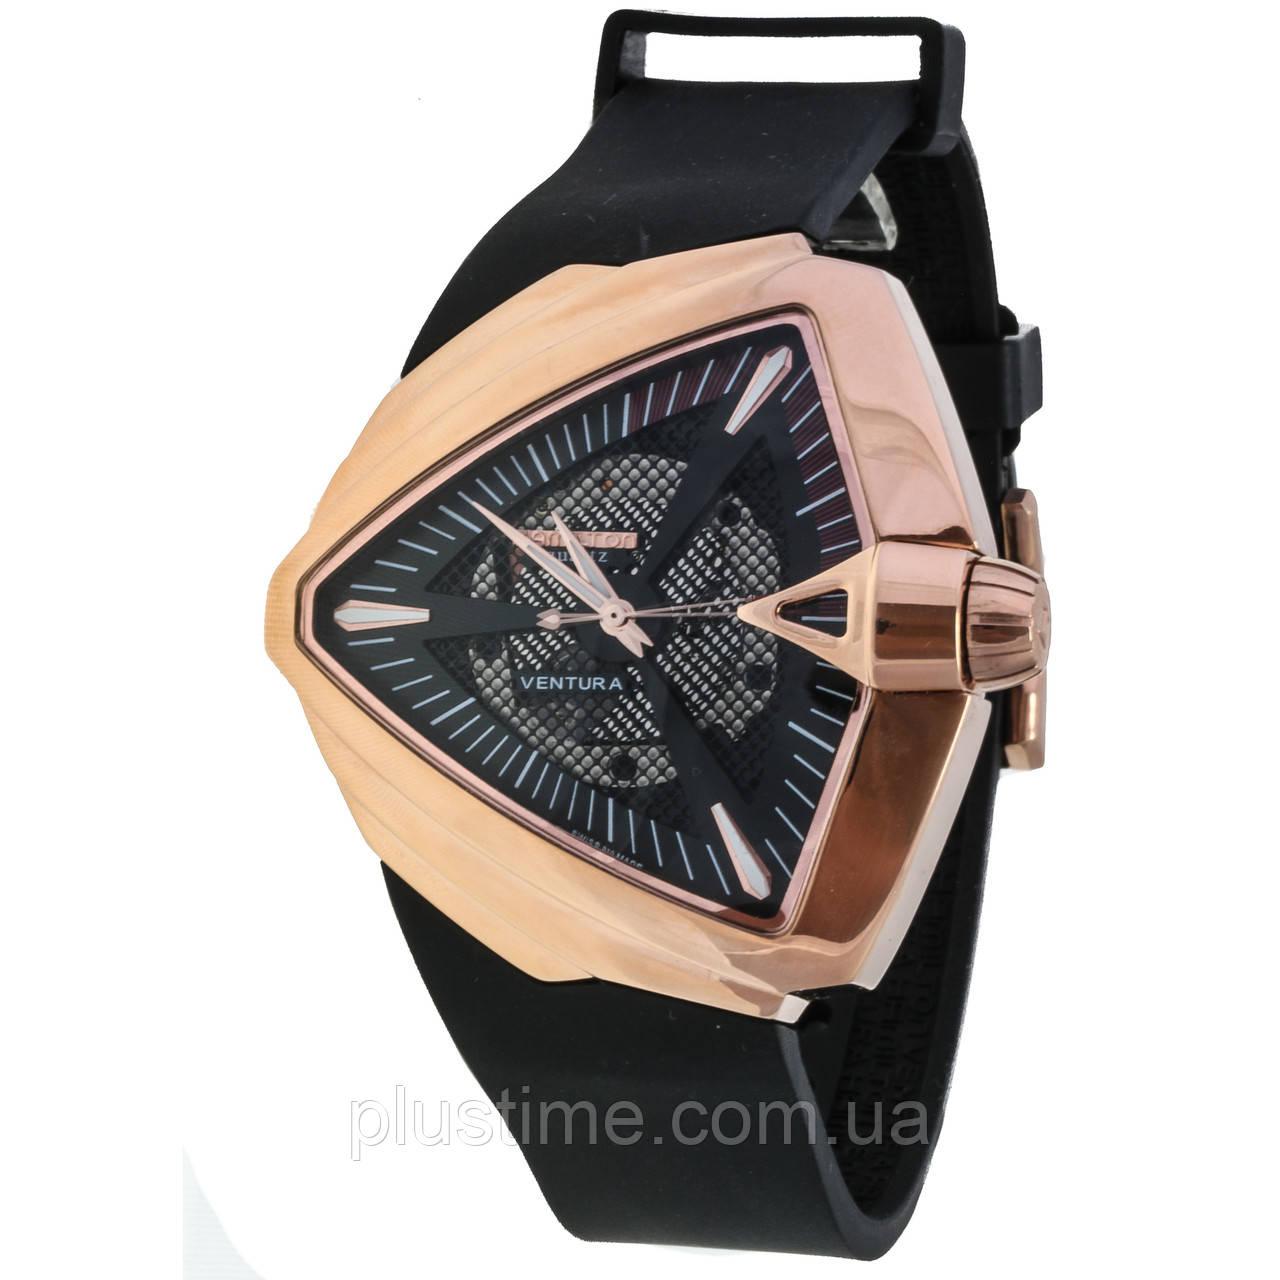 Наручные часы ventura механизмы наручных часов